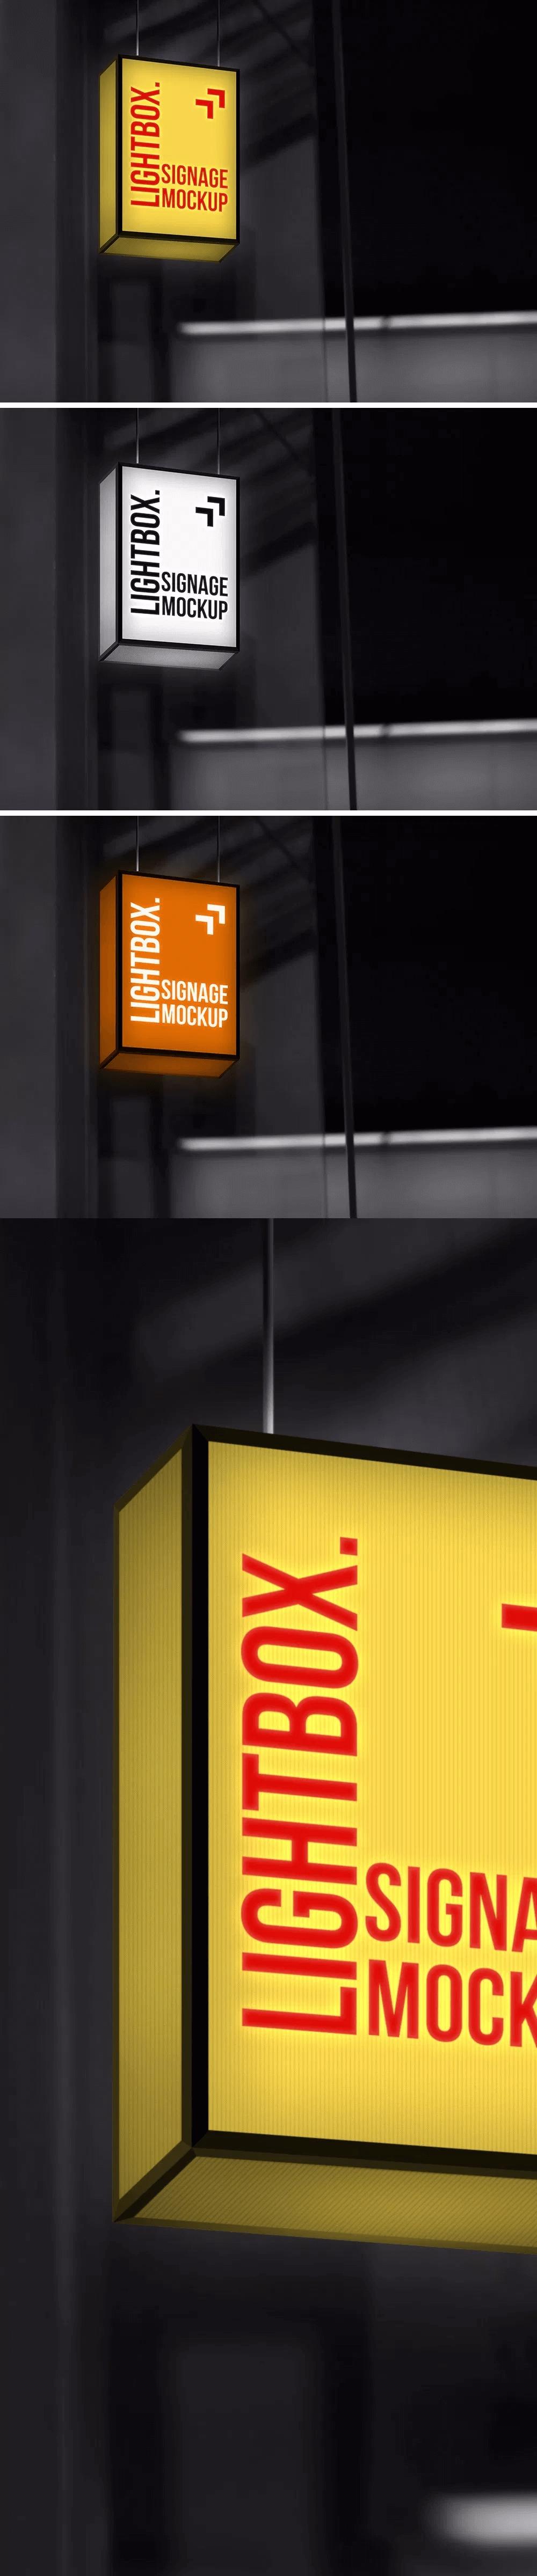 PSD Mockup Lightbox